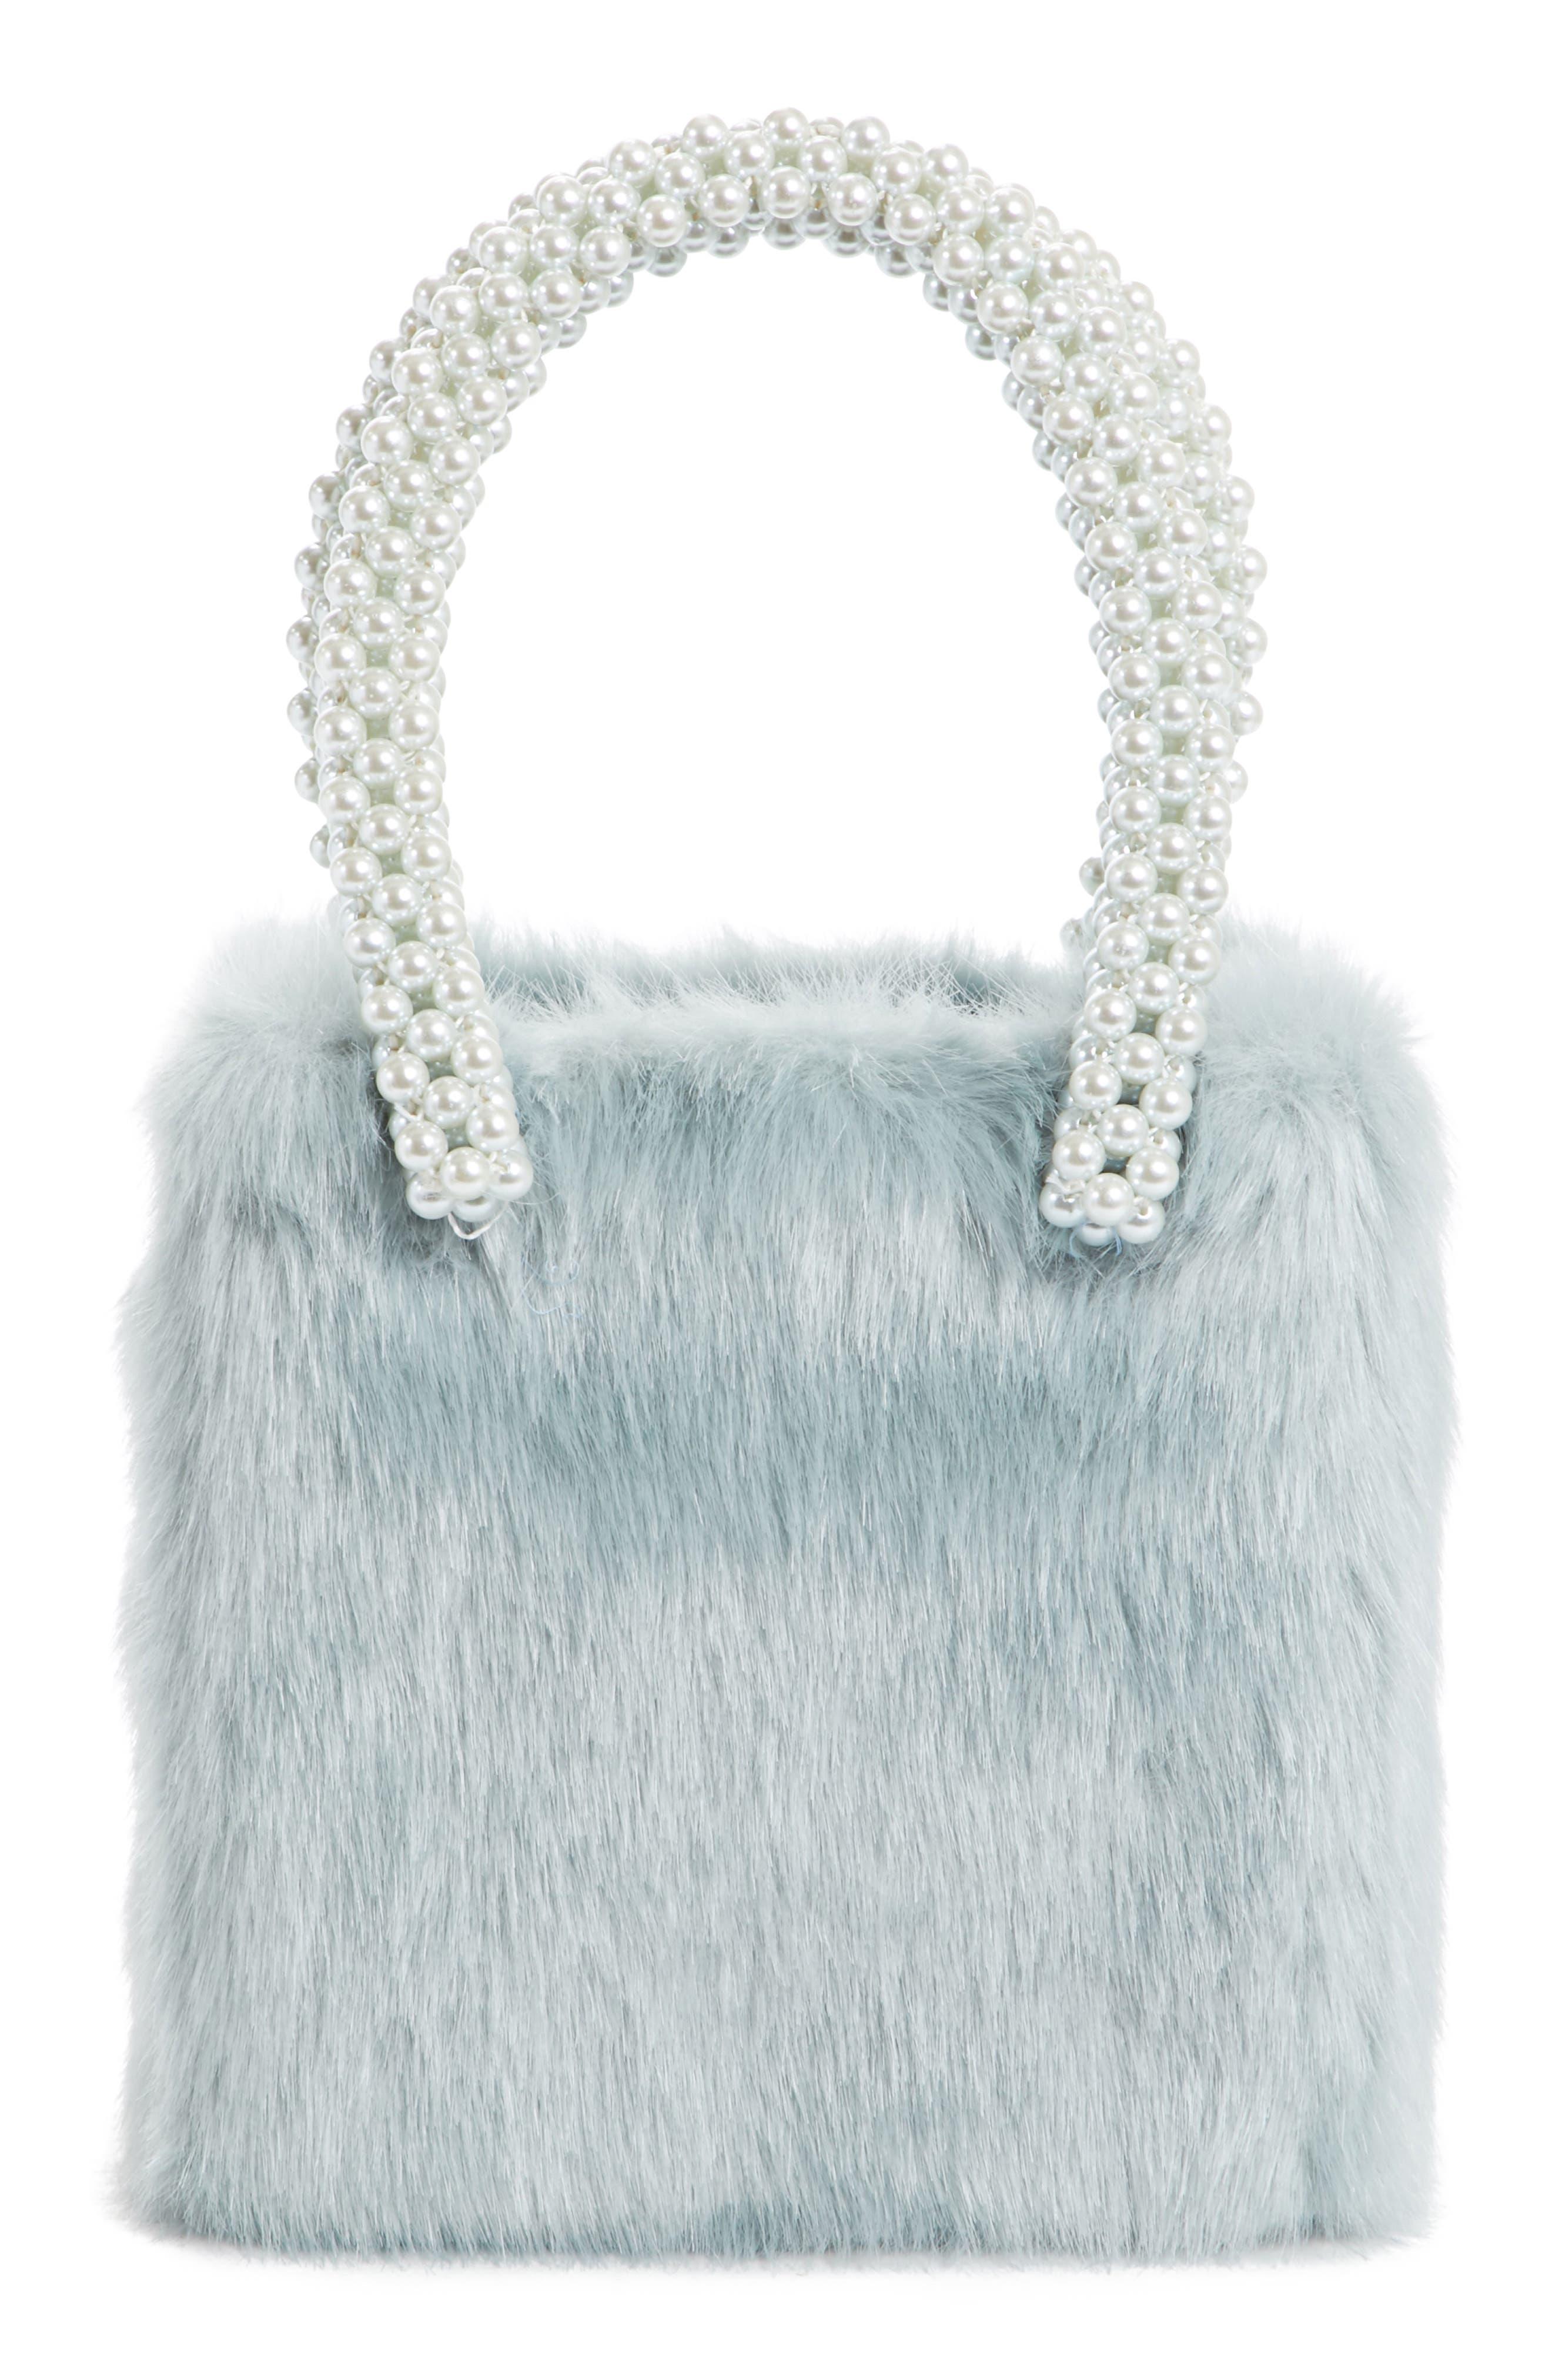 Una Check Faux Fur Bag with Imitation Pearl Handles,                             Alternate thumbnail 3, color,                             440